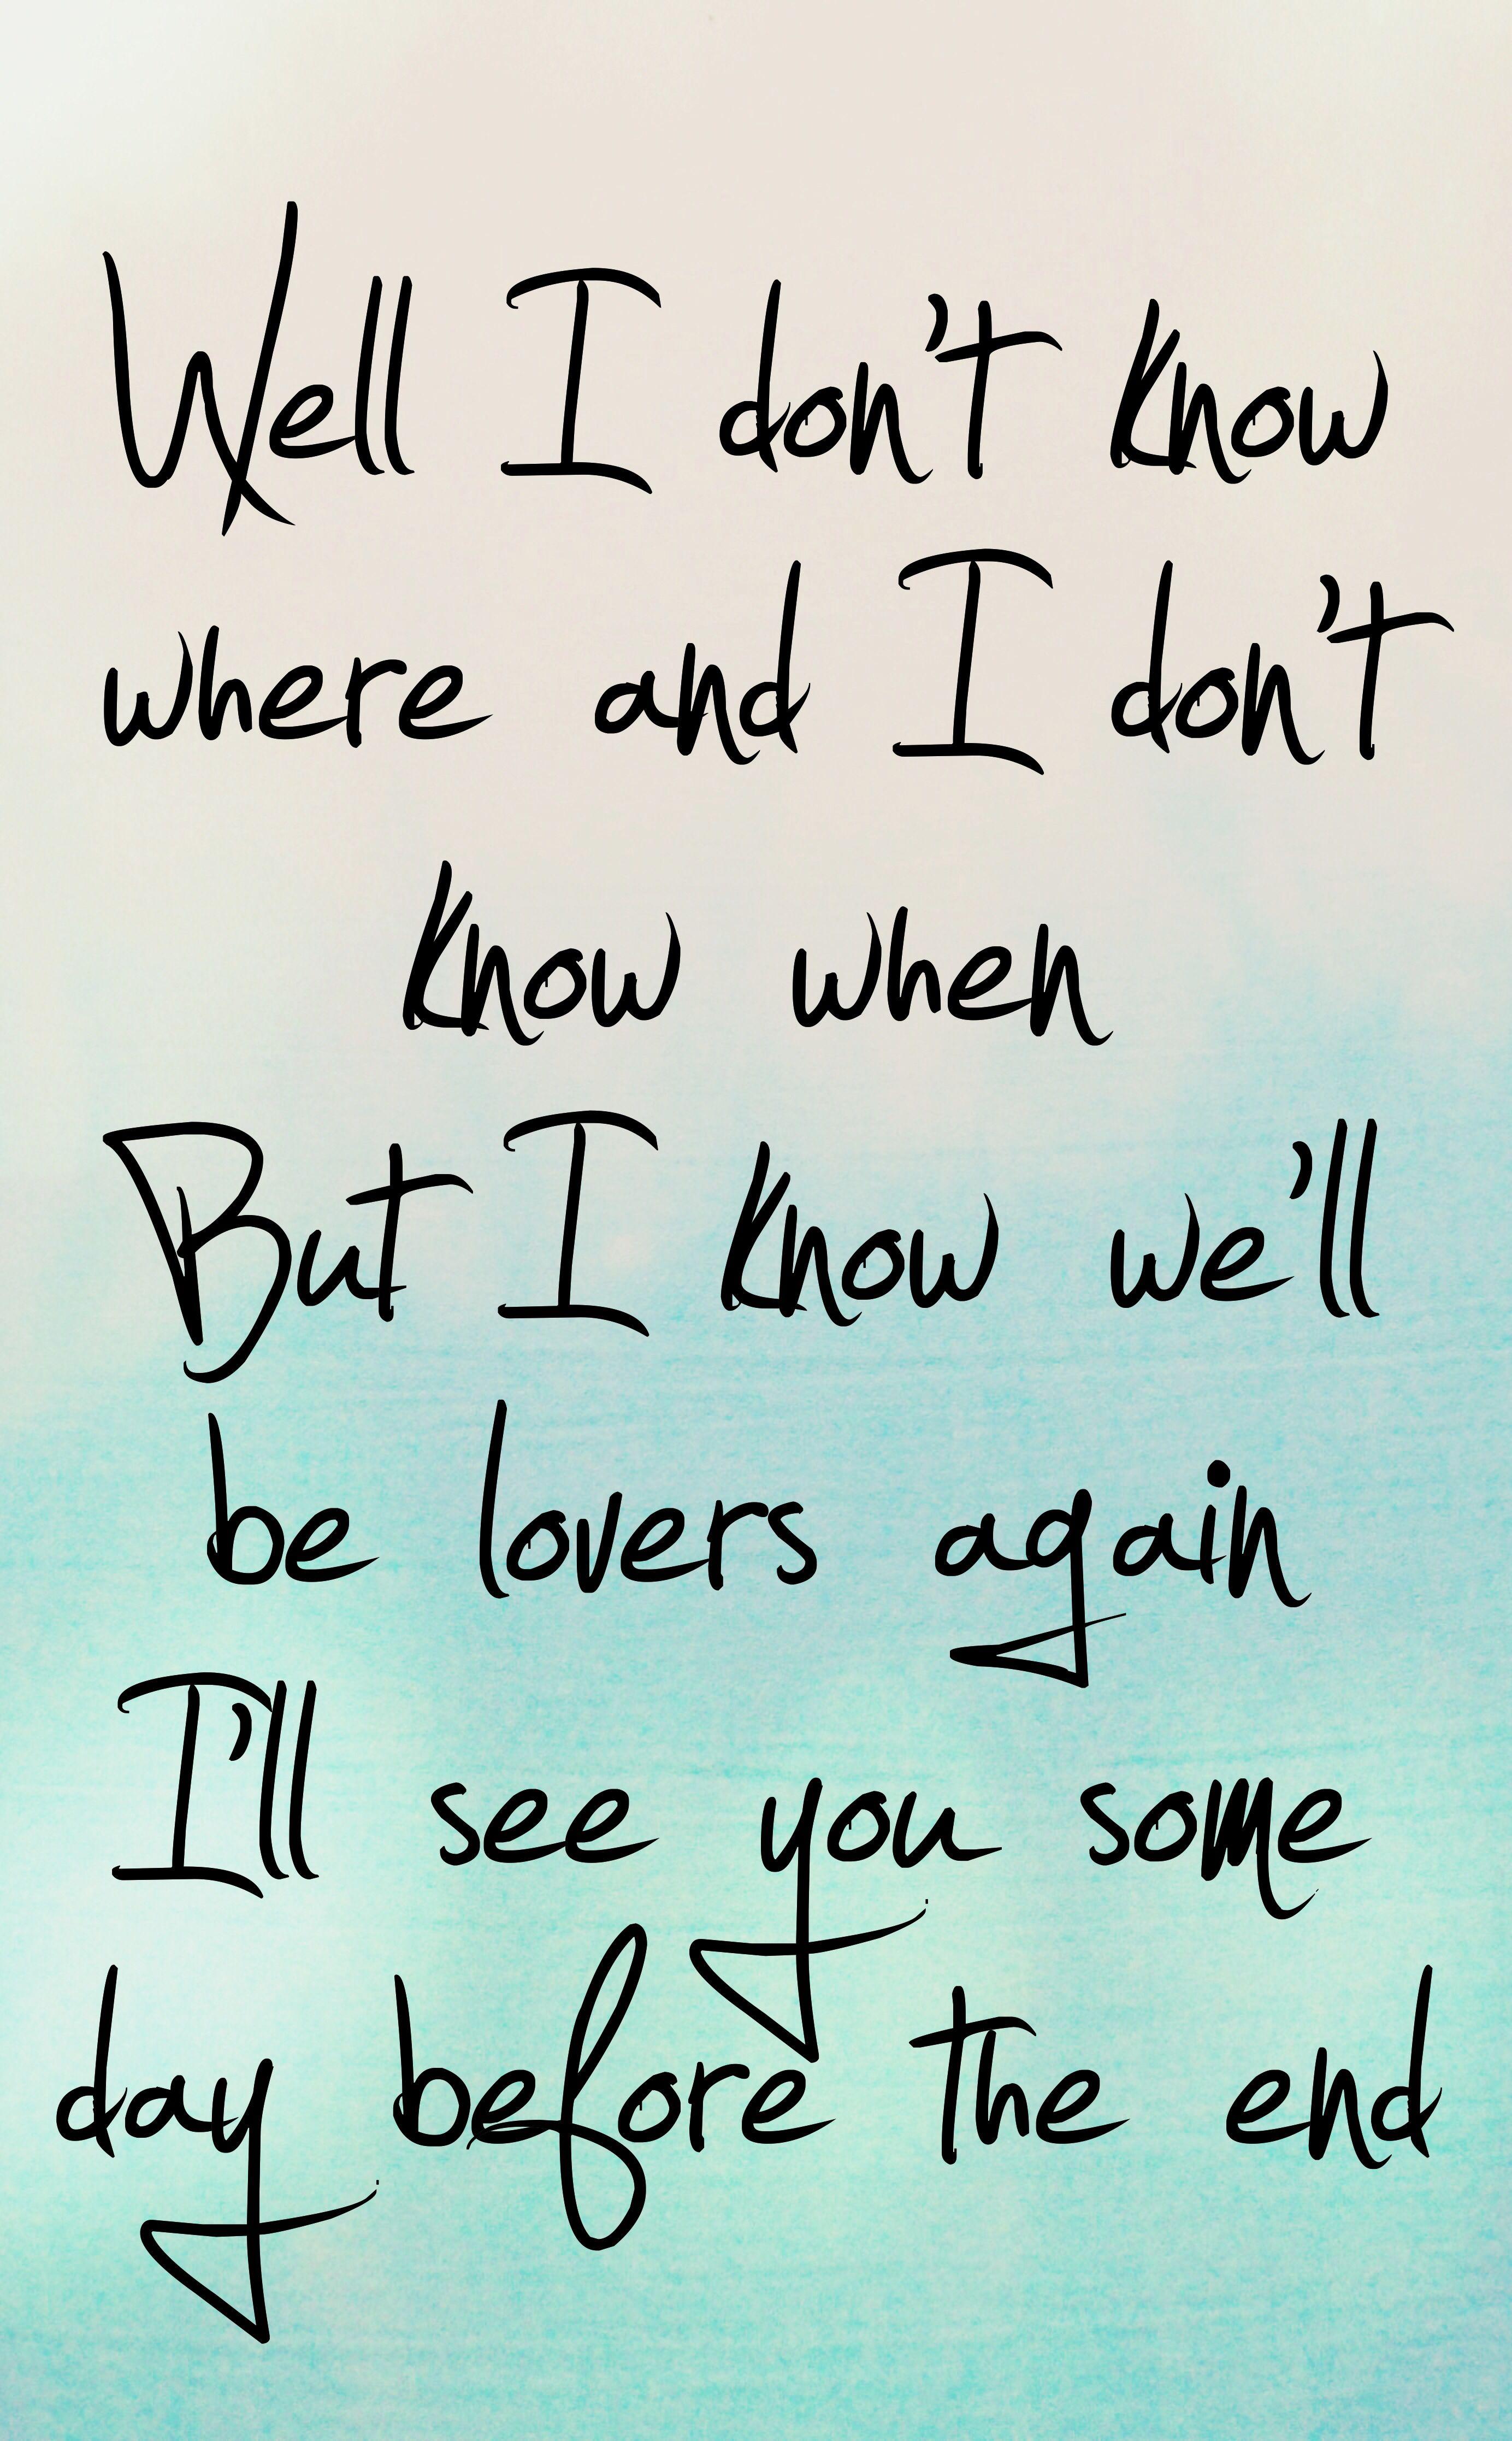 Marco & Seba - Fire To My Heart (Lyrics & Audio)   Lyrics ...